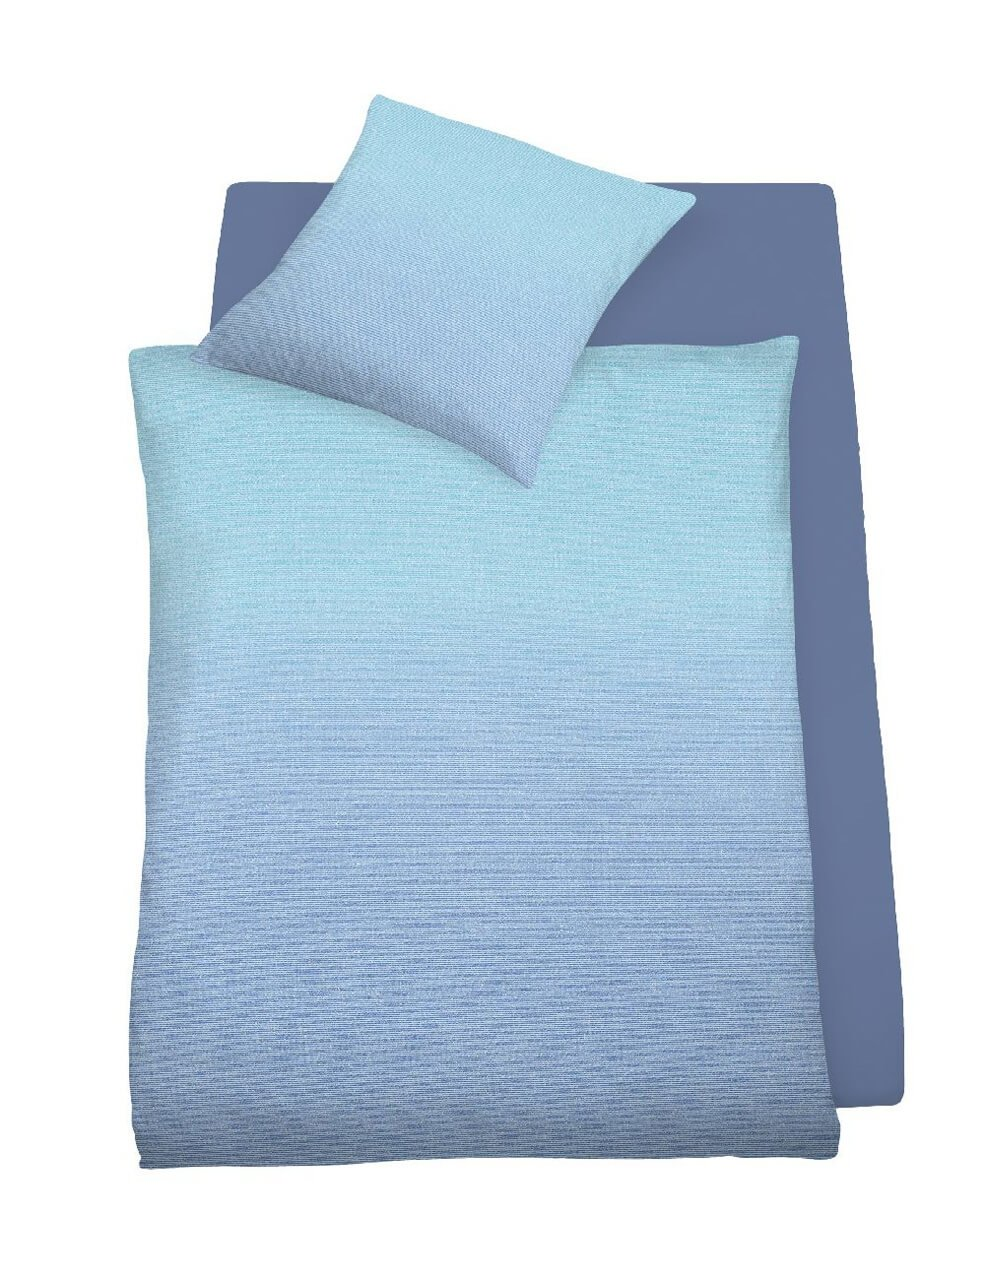 Liebenswert Wasserbettbedarf Beste Wahl Schlafgut Maco Satin Bed Sheets Formentera Riviera,